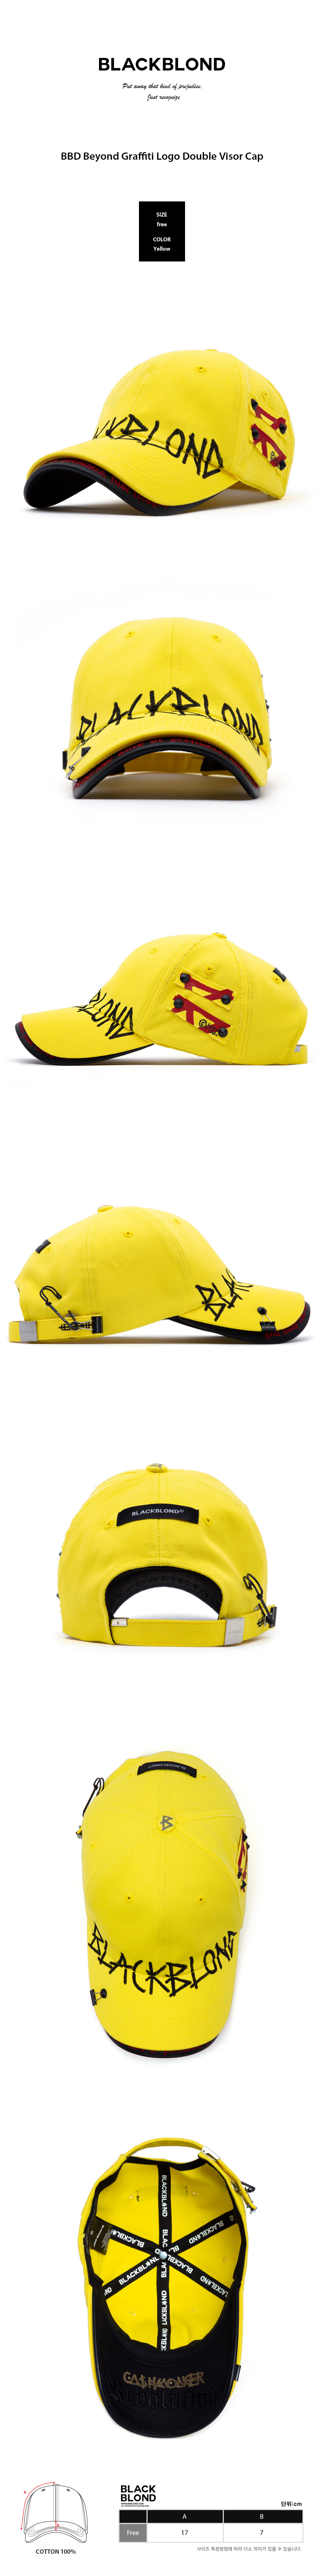 BLACKBLOND - BBD Beyond Graffiti Logo Double Visor Cap (Yellow)